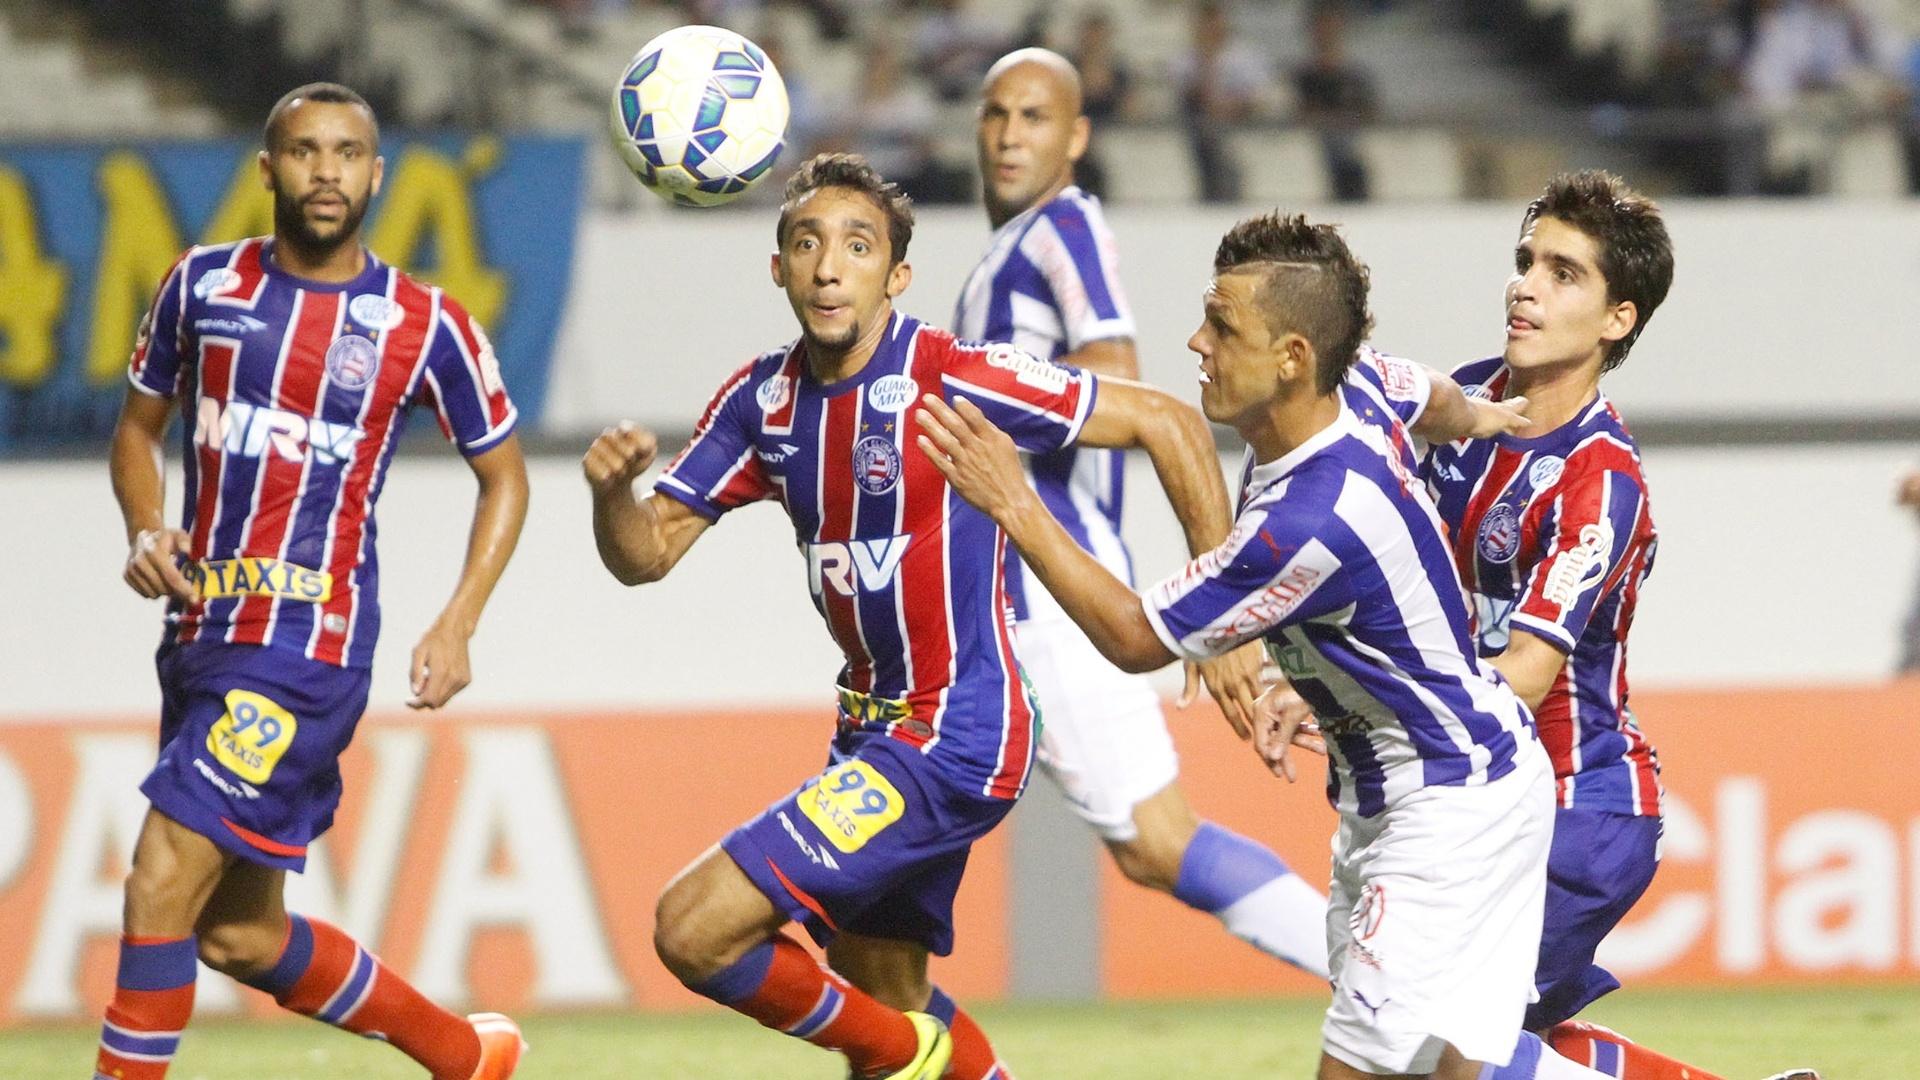 Lance da partida entre Paysandu e Bahia, válida pela terceira fase da Copa do Brasil